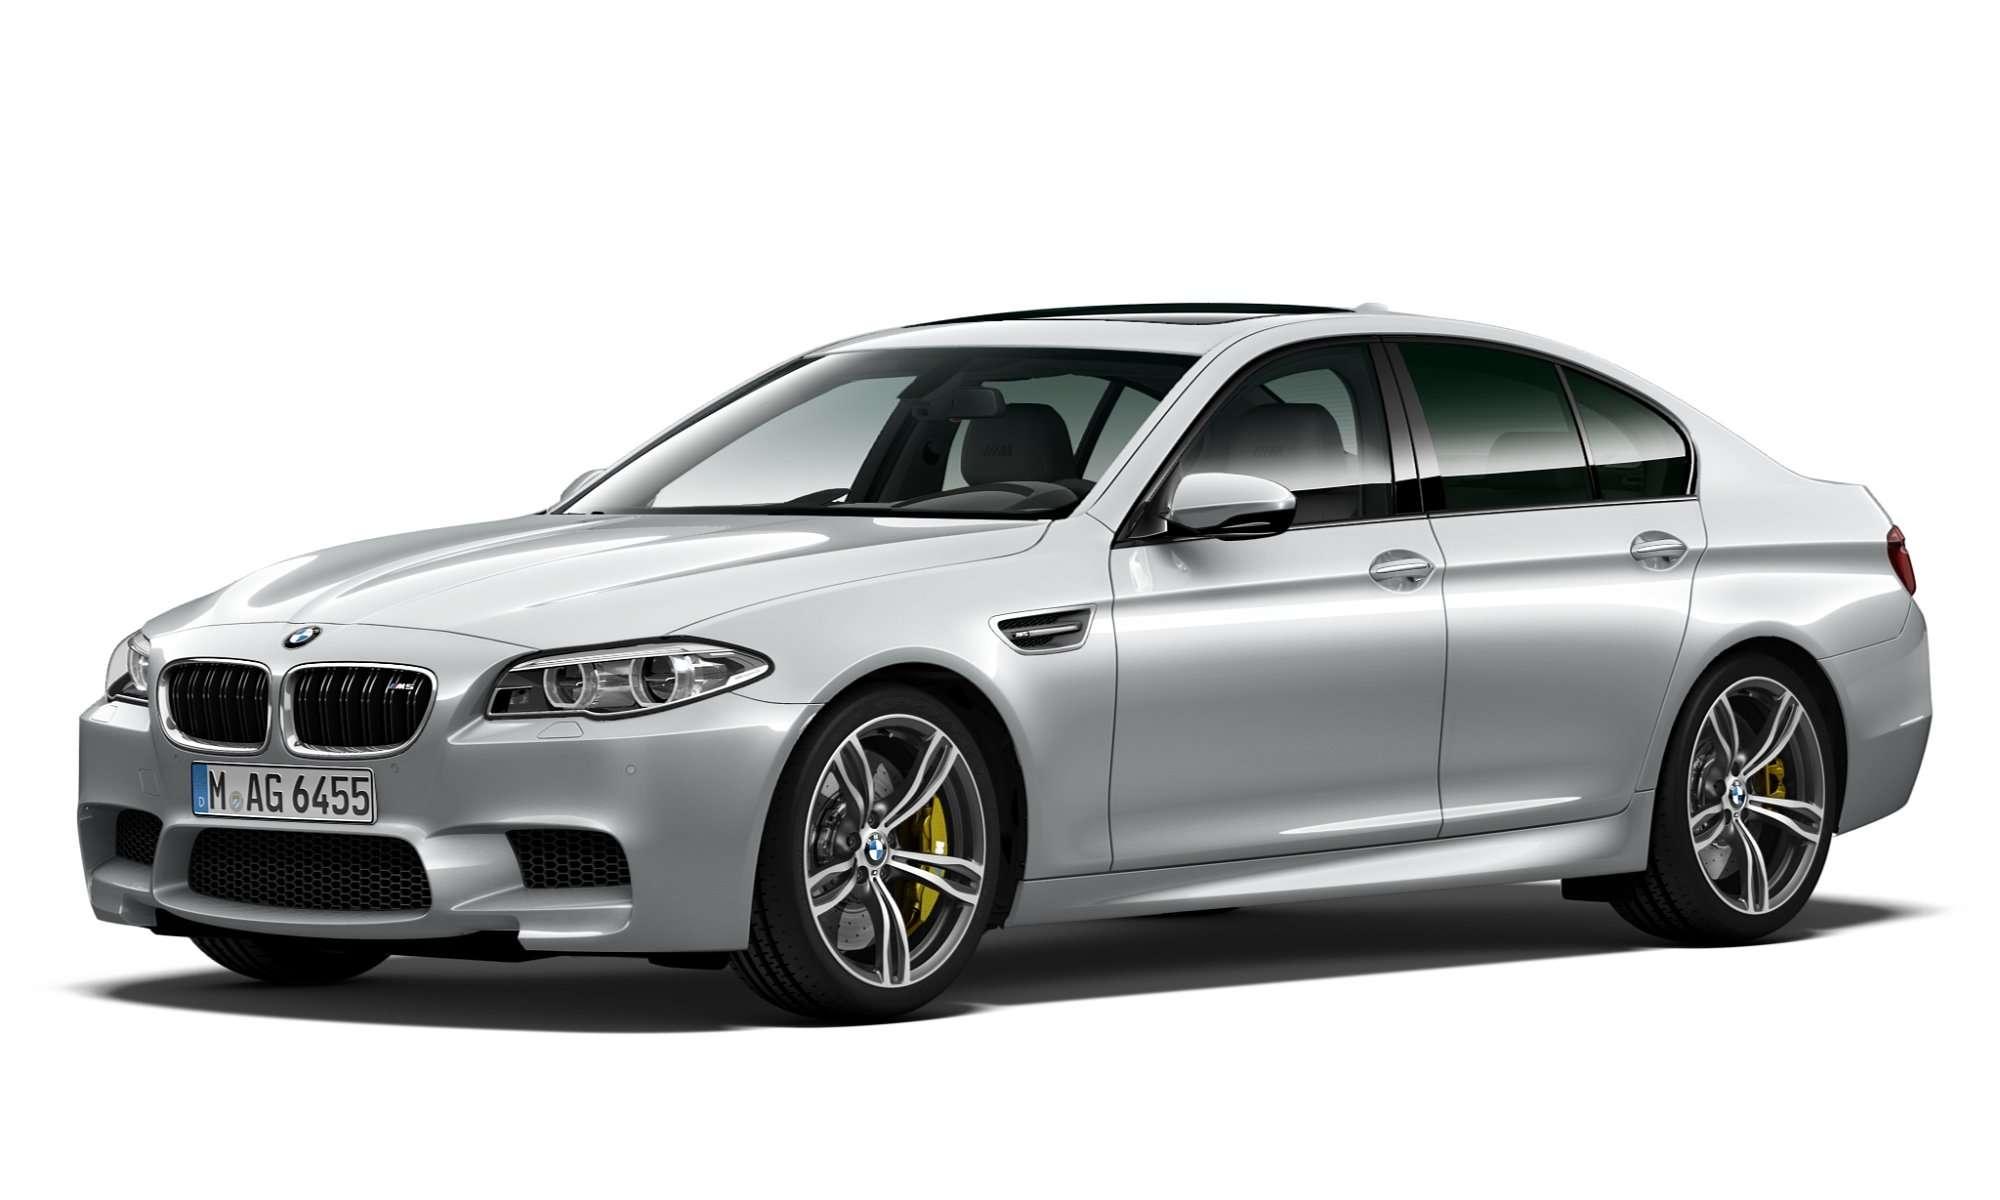 BMW (БМВ) M5